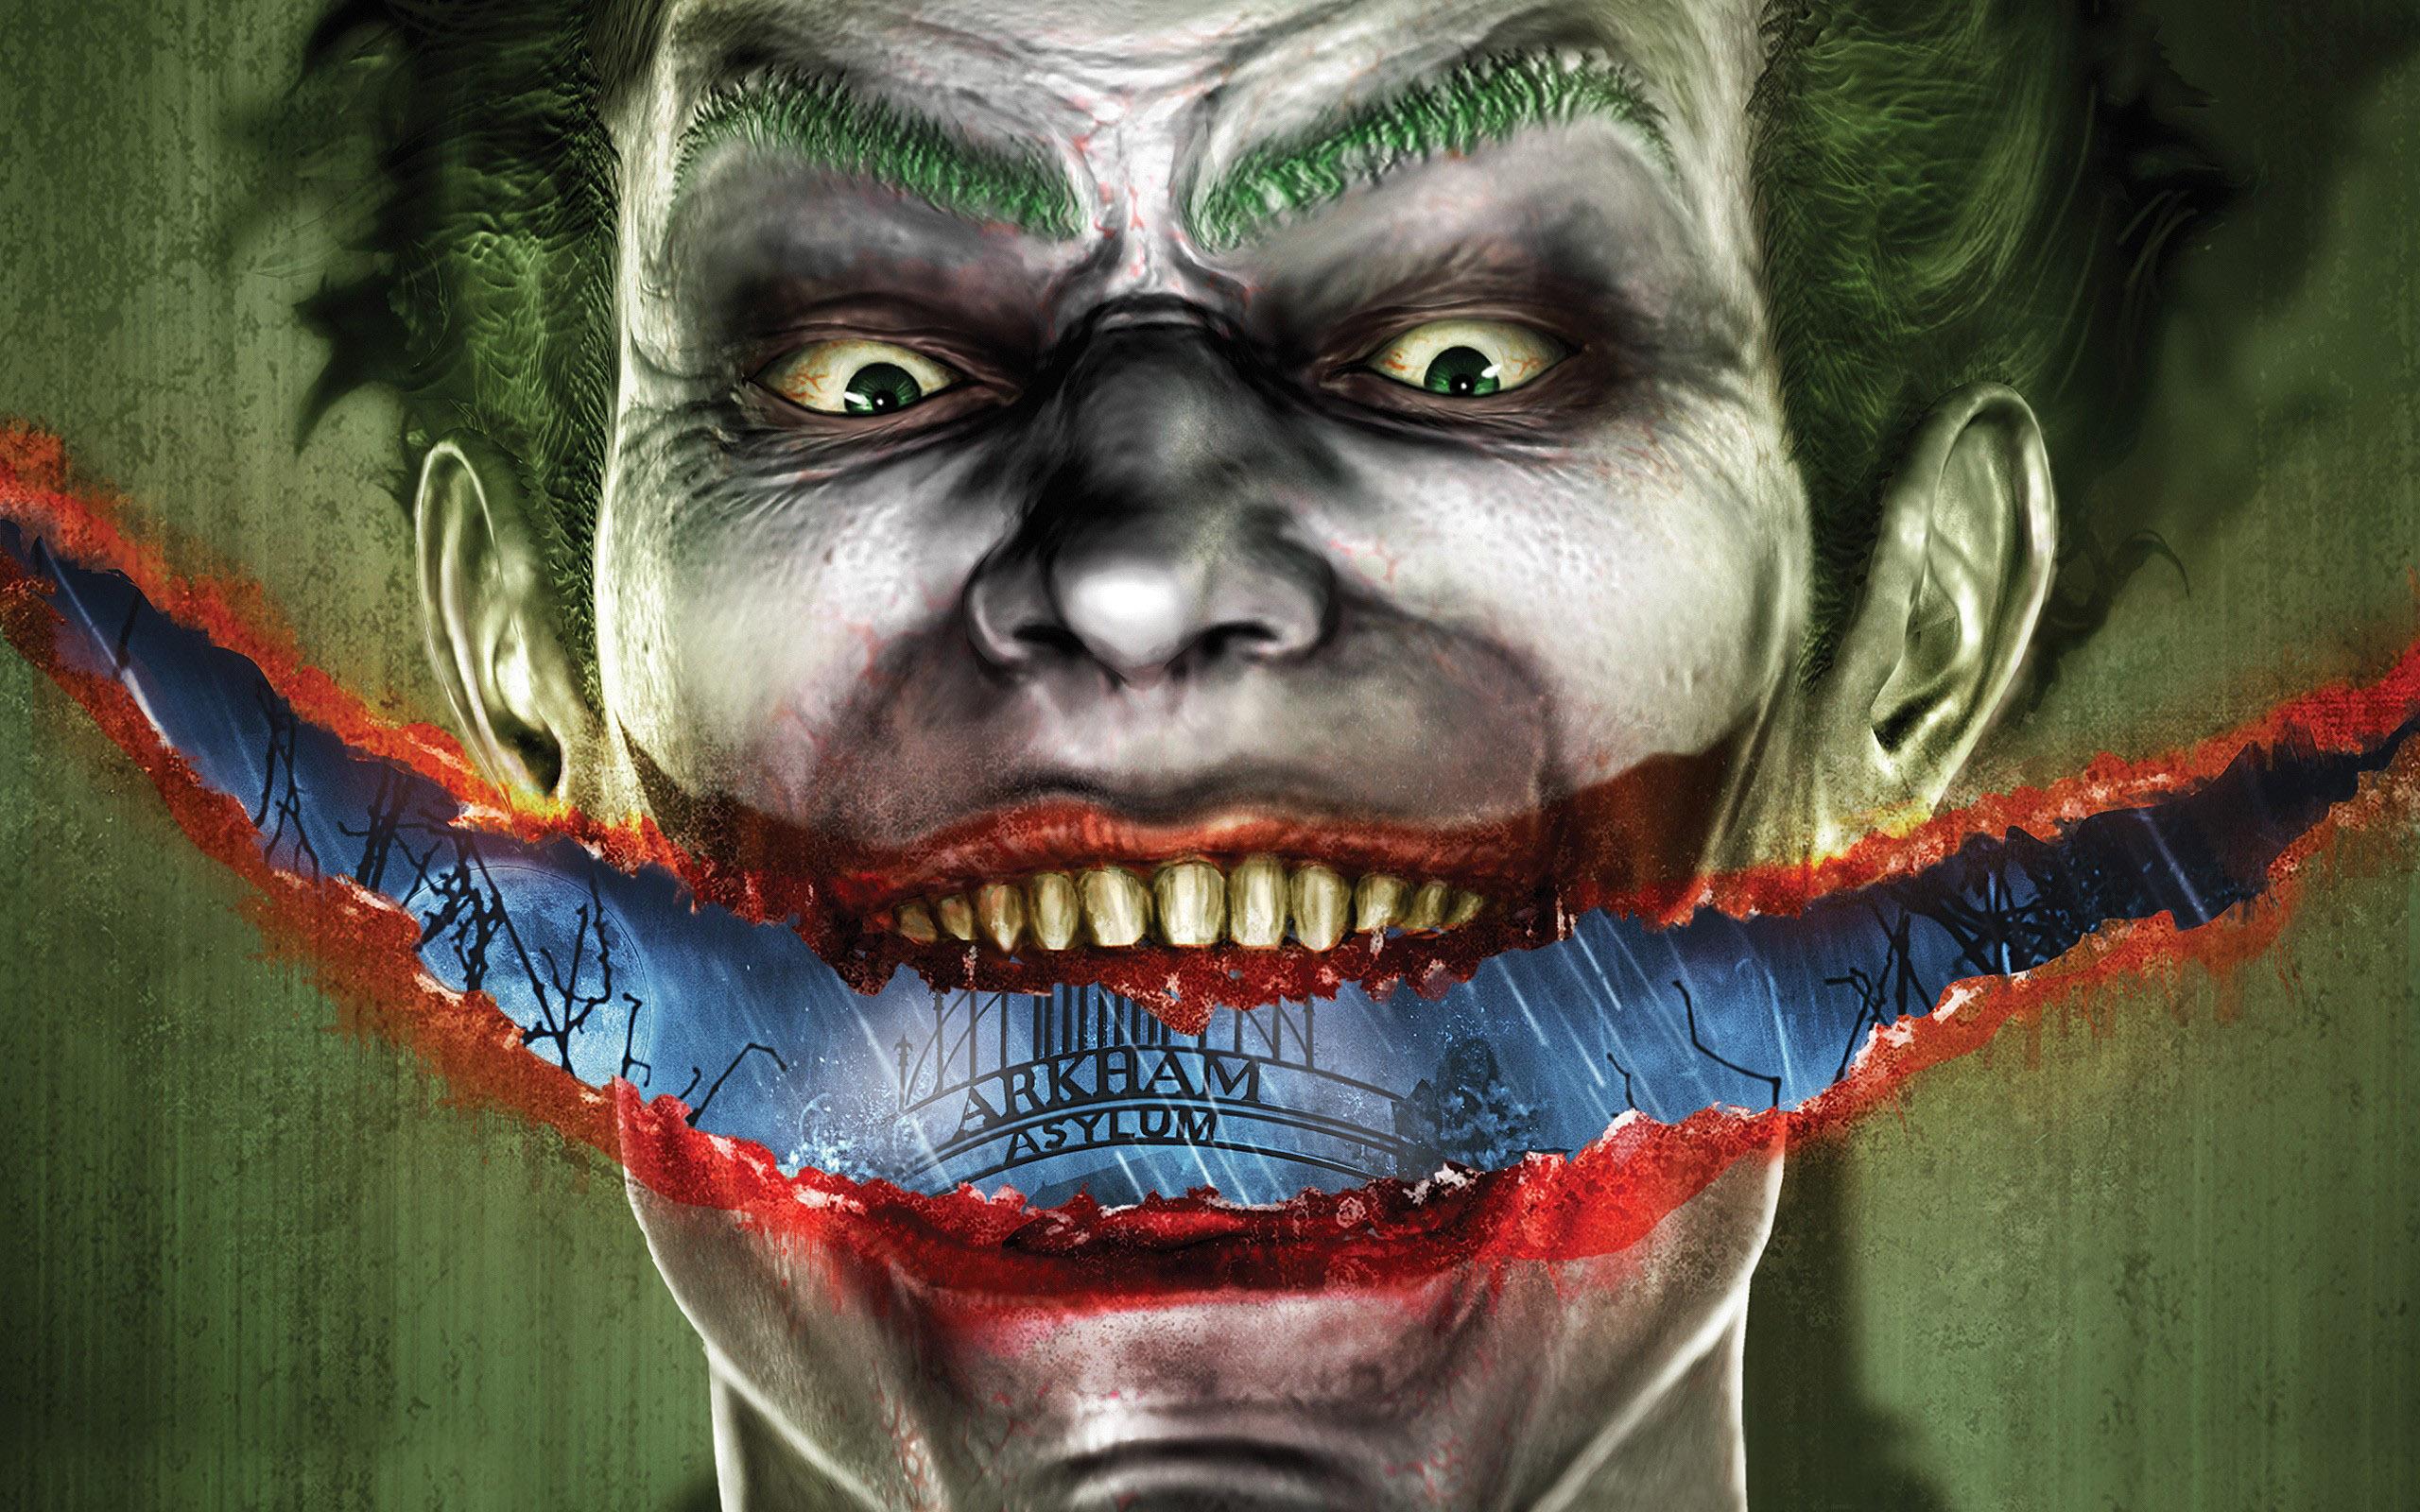 Joker Batman Arkham Asylum wallpapers HD   425676 2560x1600